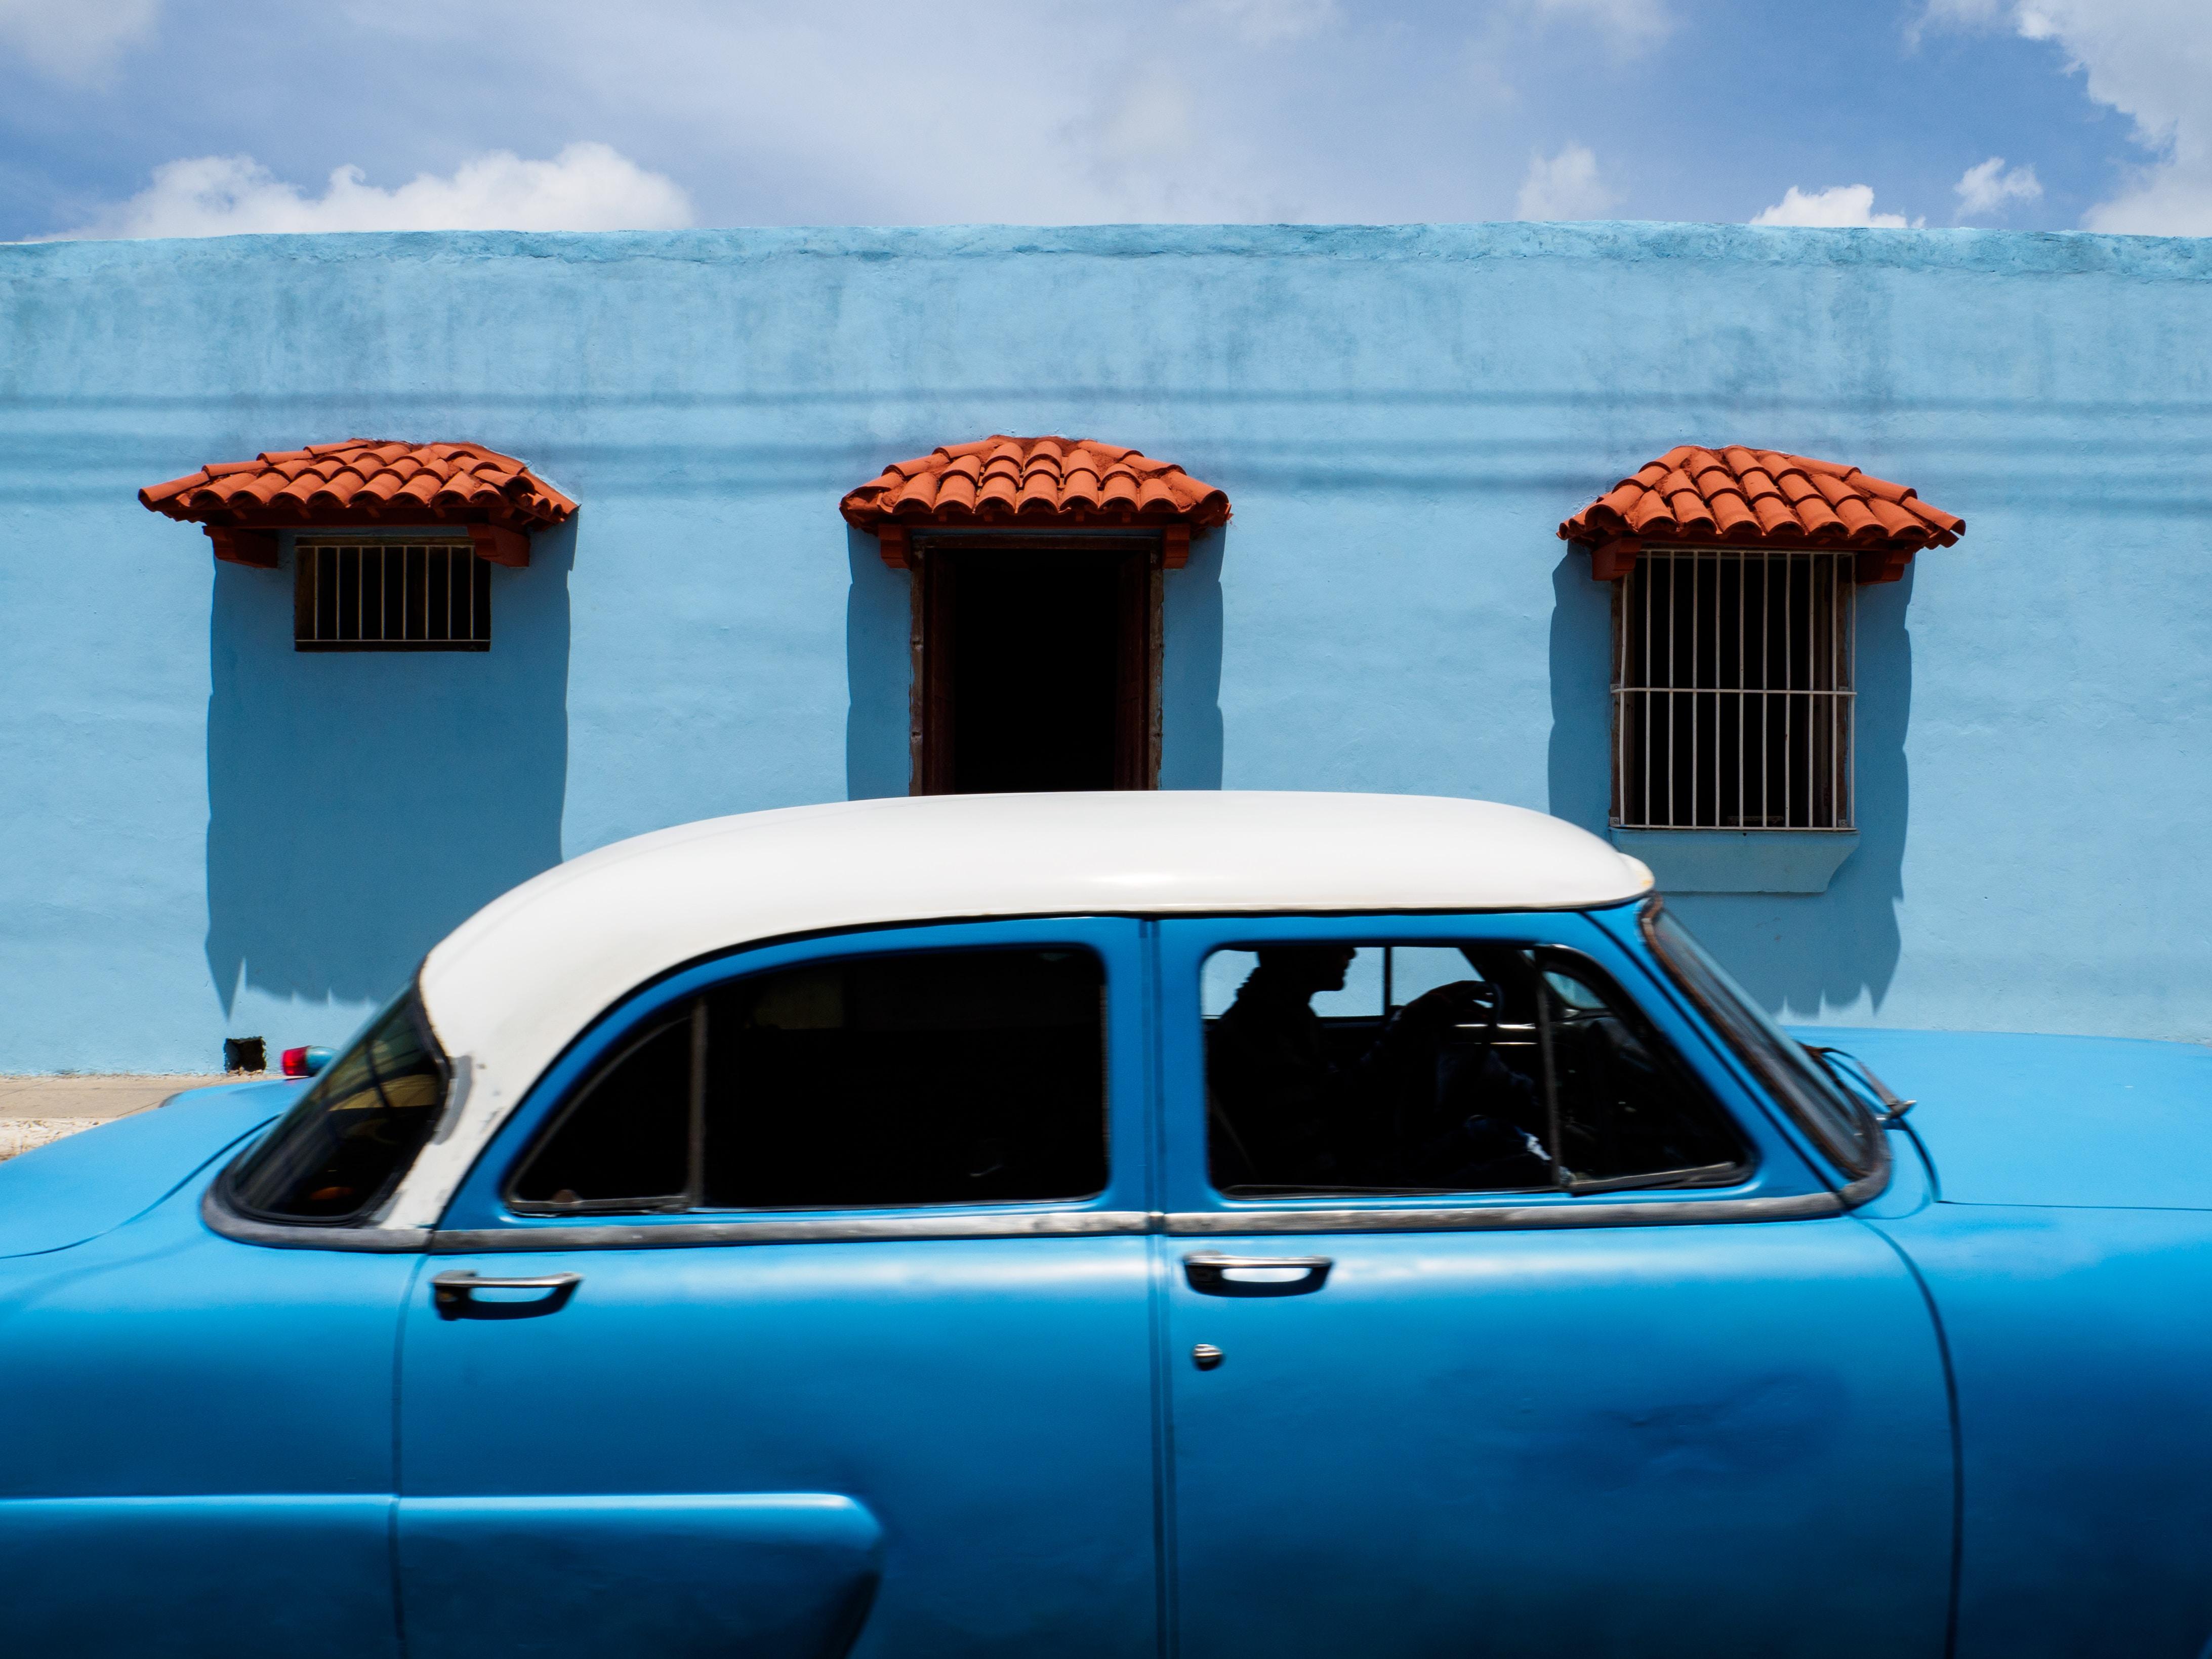 blue and white sedan during daytime